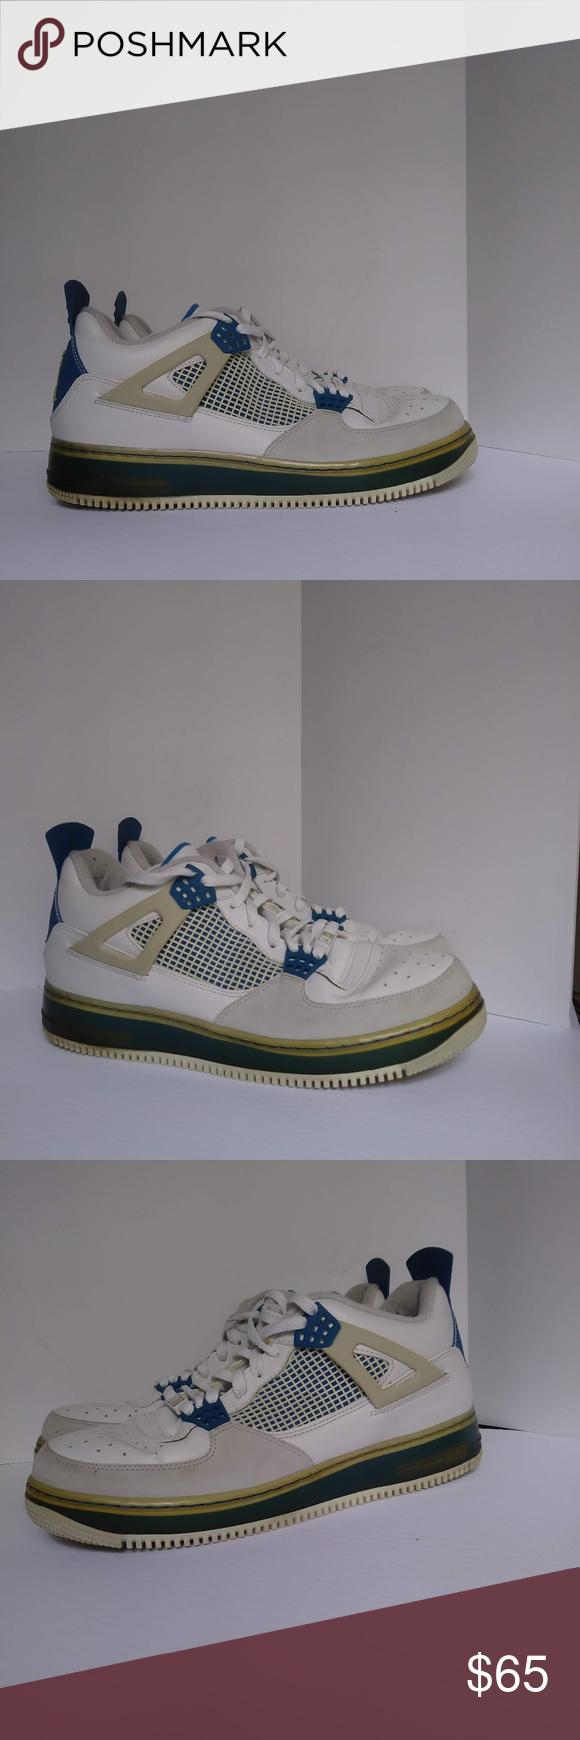 f1d72f70047 Air Jordan Force IV (AJF 4) Fusion Size 11 Pre-owned Men's Nike Air ...